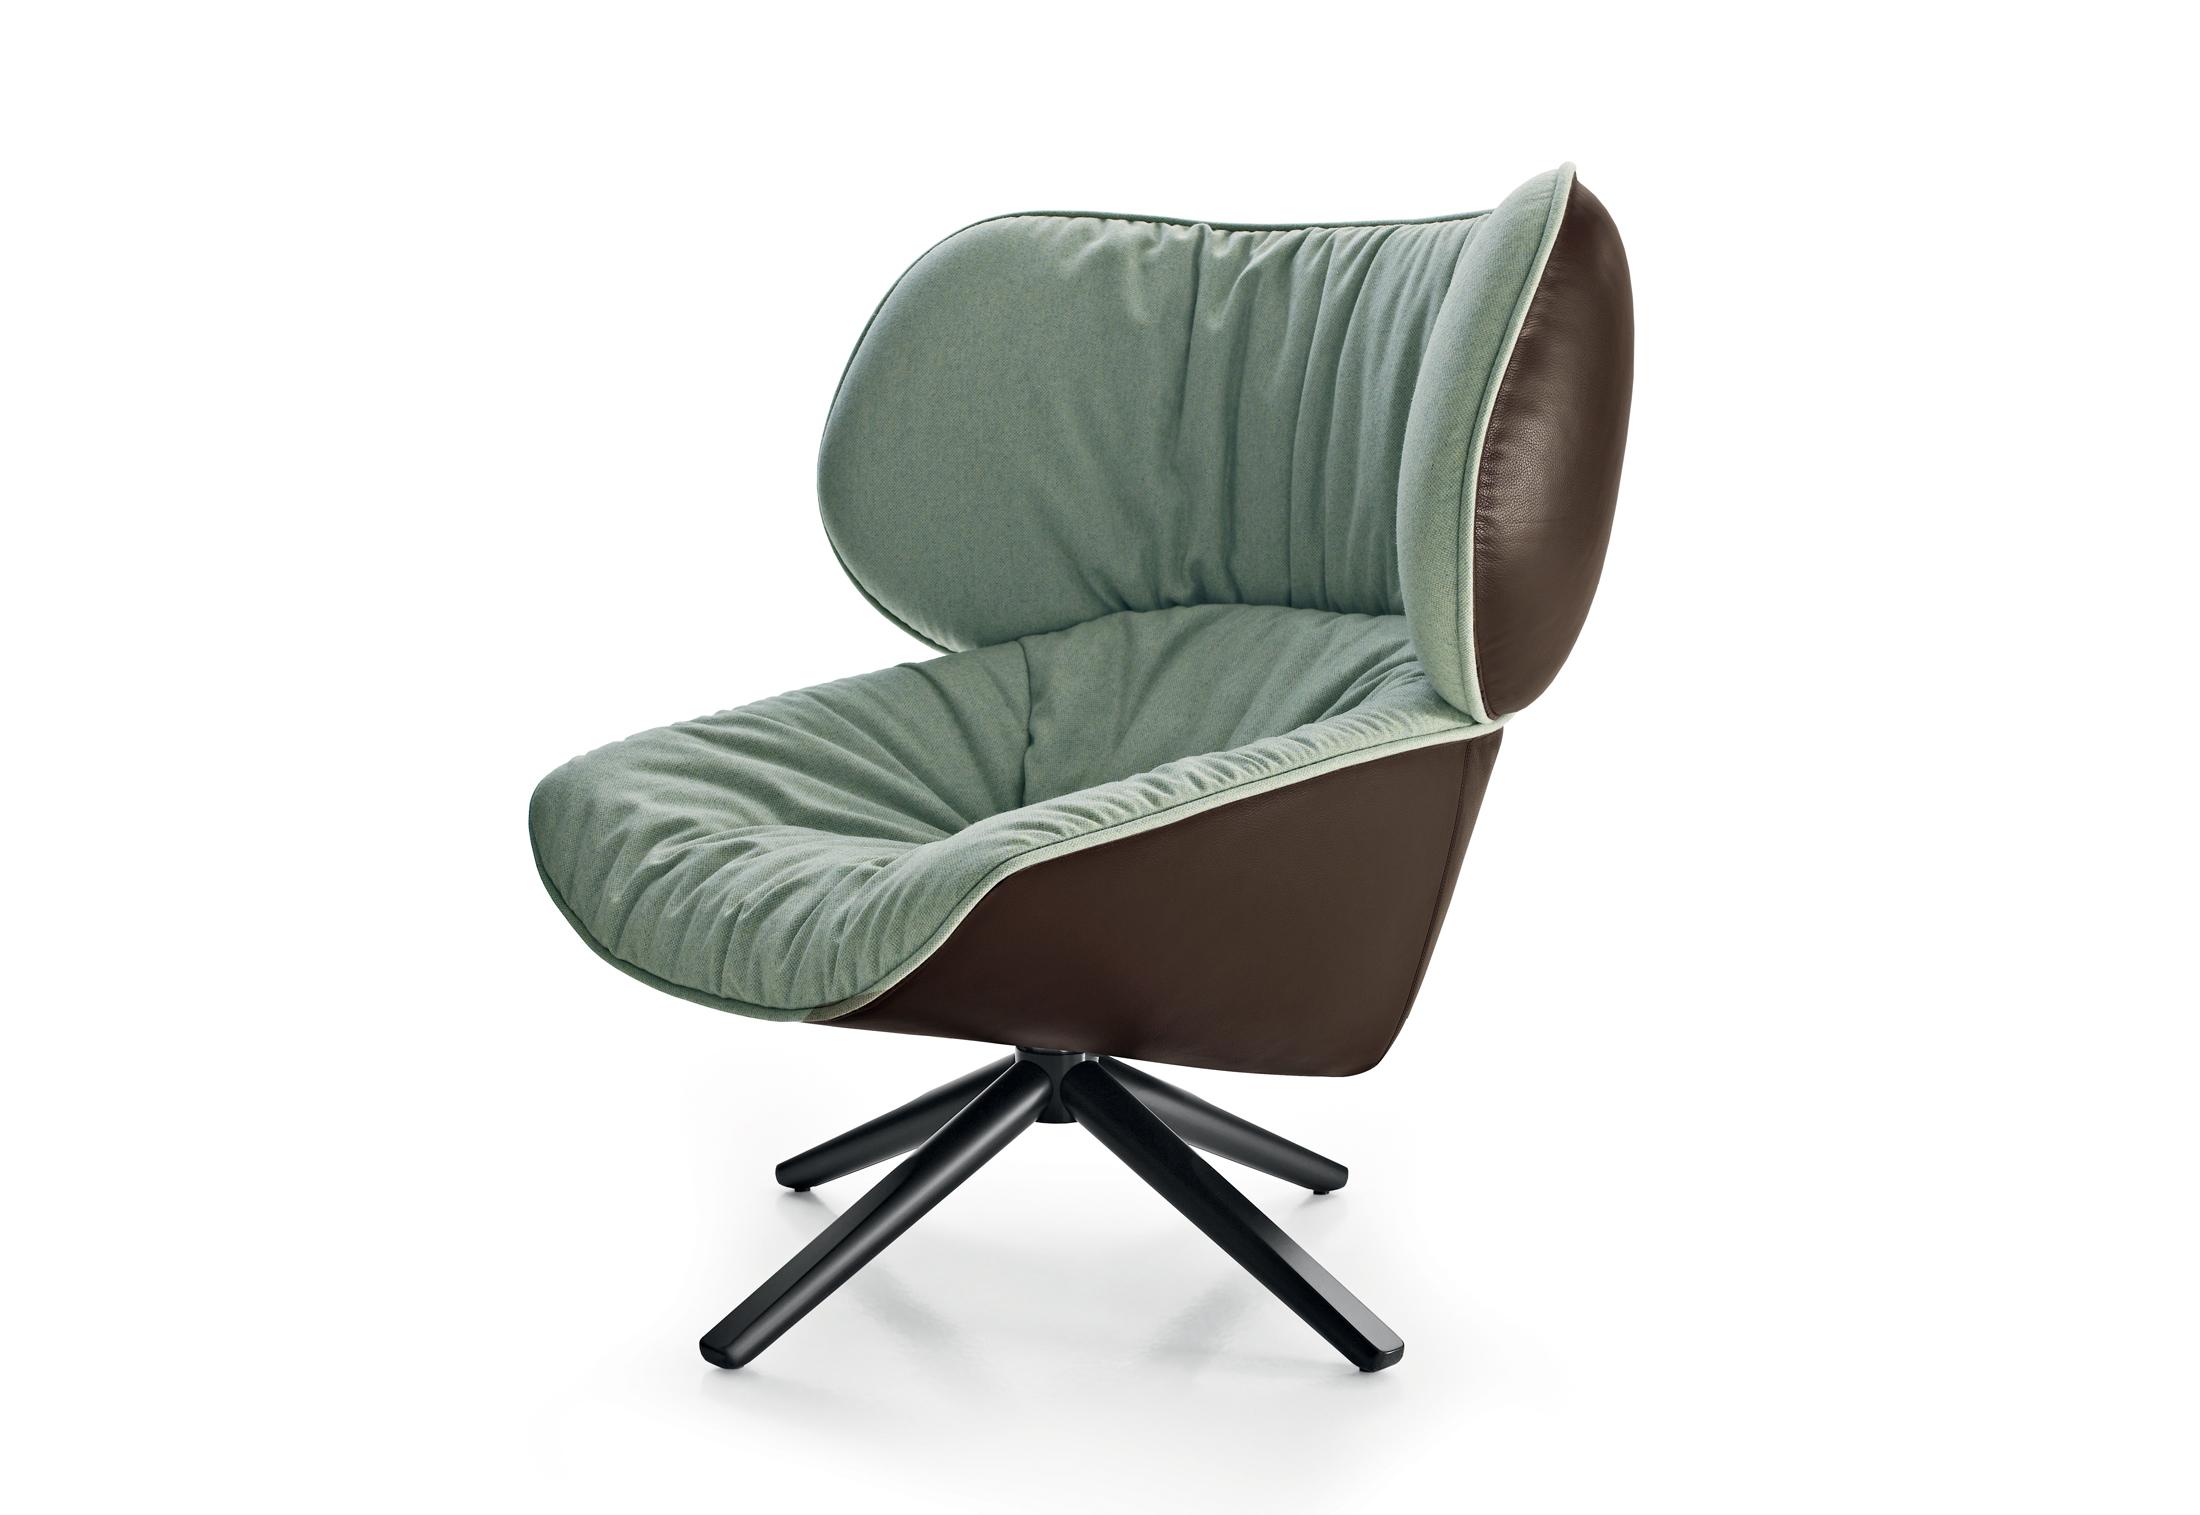 TABANO Swivel Chair by Patricia Urquiola for B&B Italia